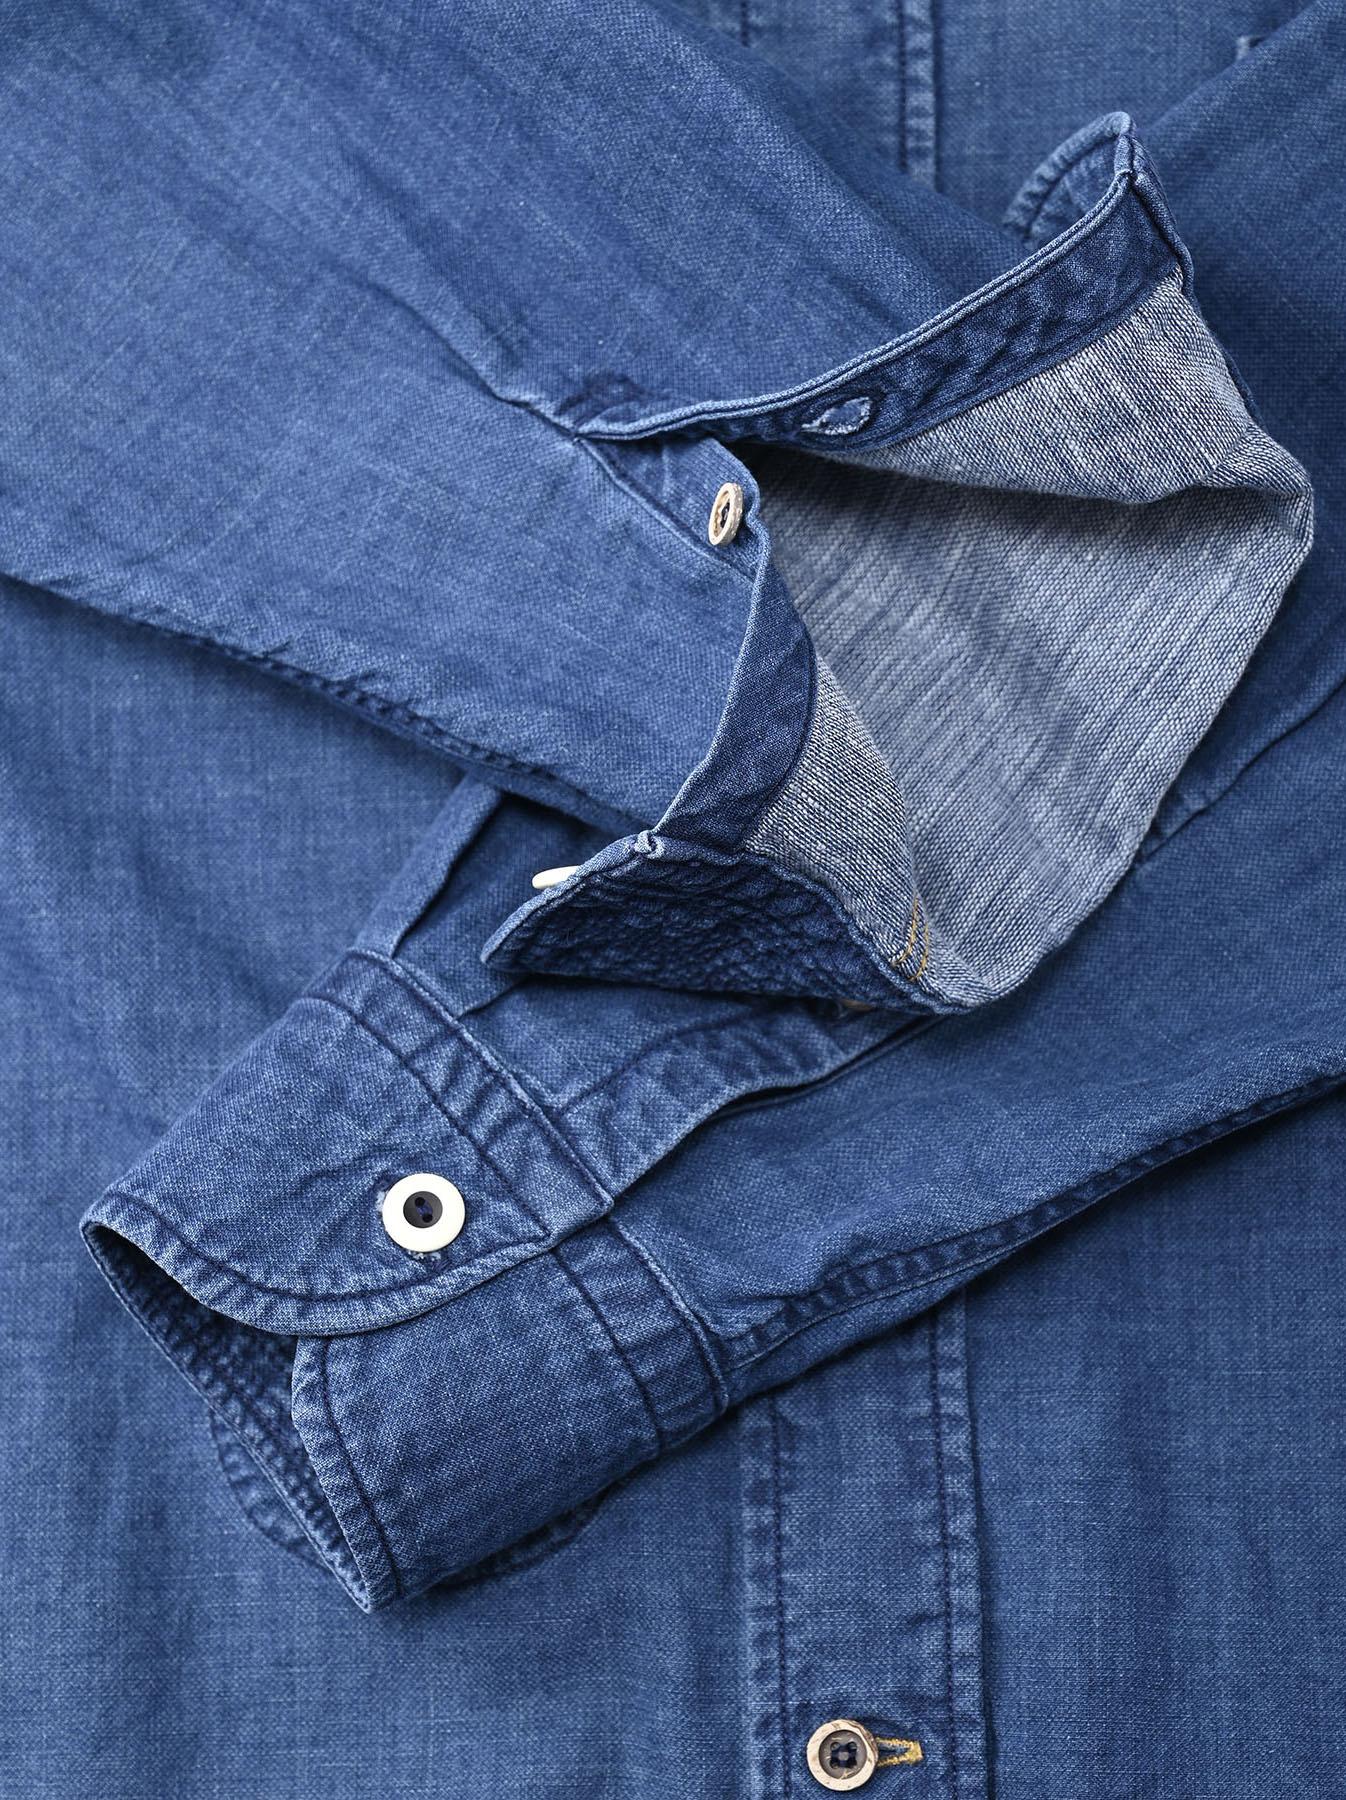 Indigo Gauze 908 Ocean Shirt Distressed-8